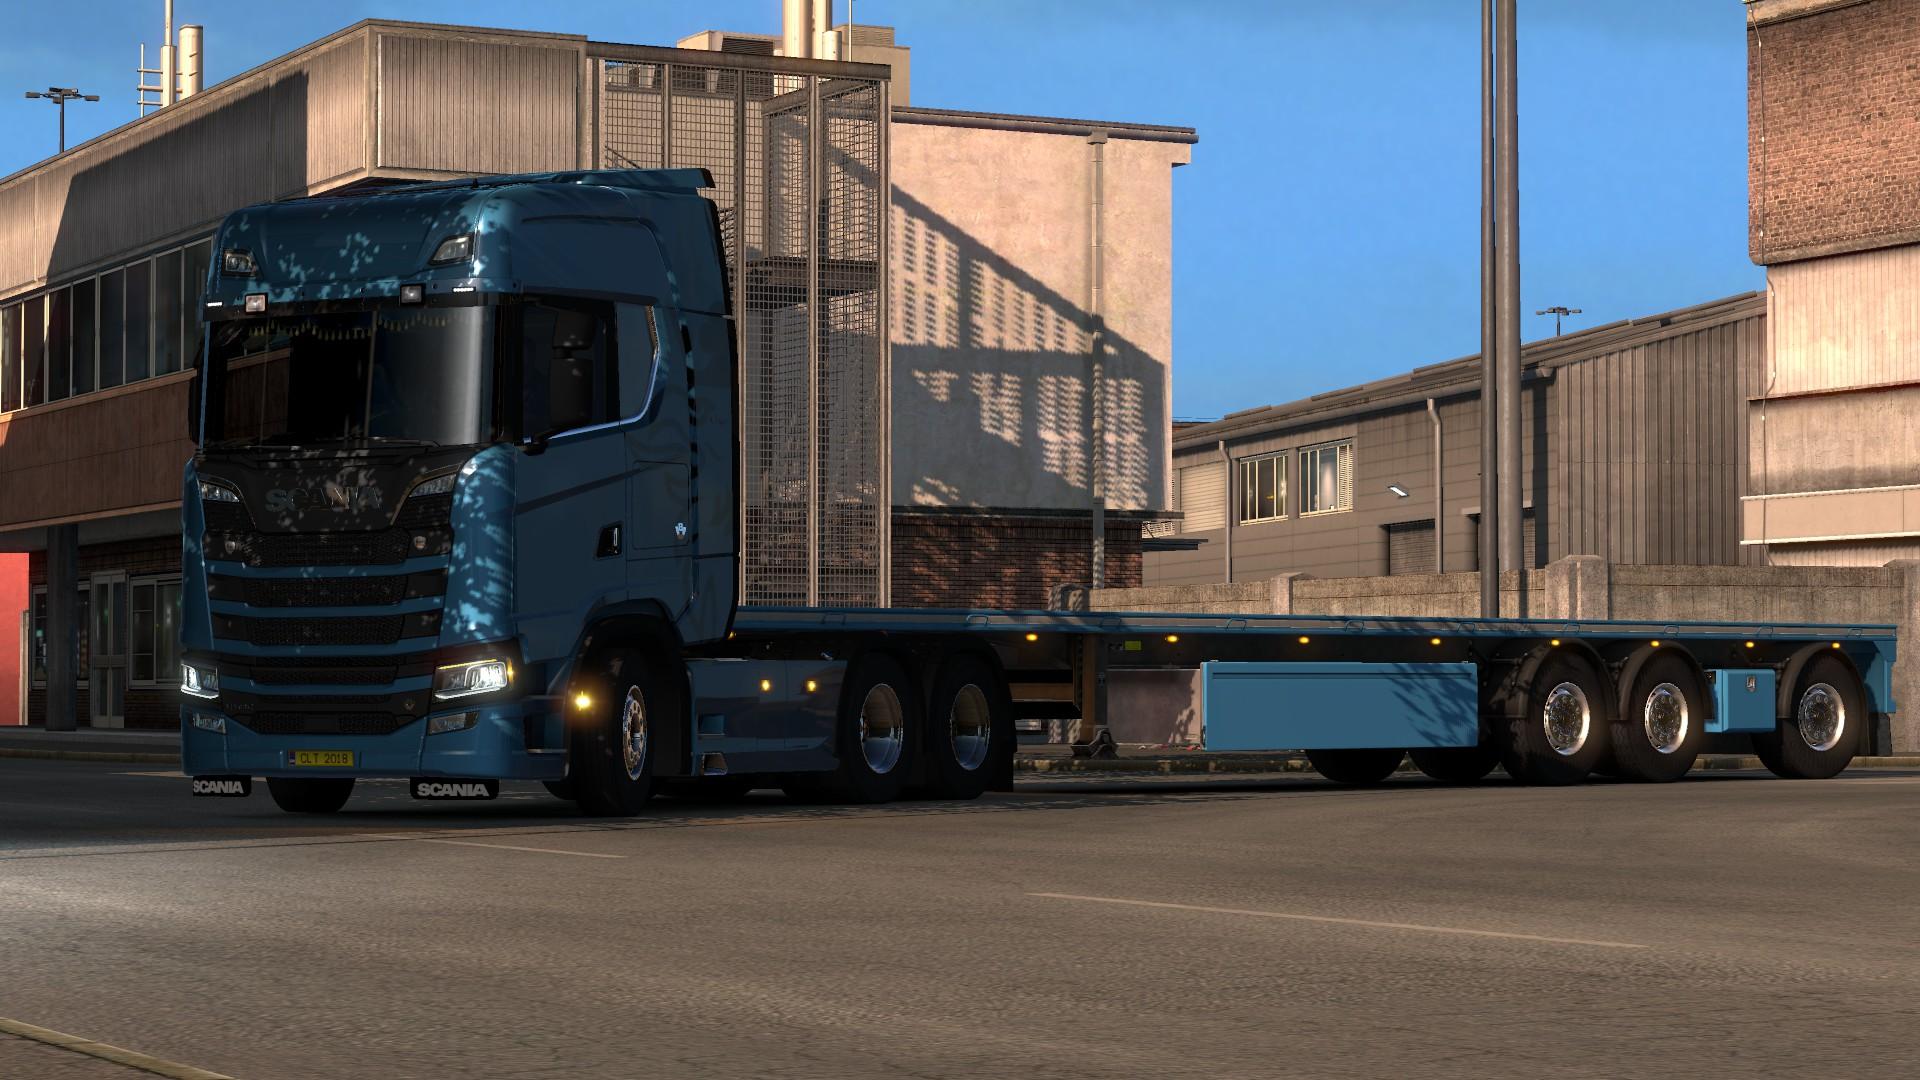 Update 1 32 trailer ownership - Solved Topics - TruckersMP Forum